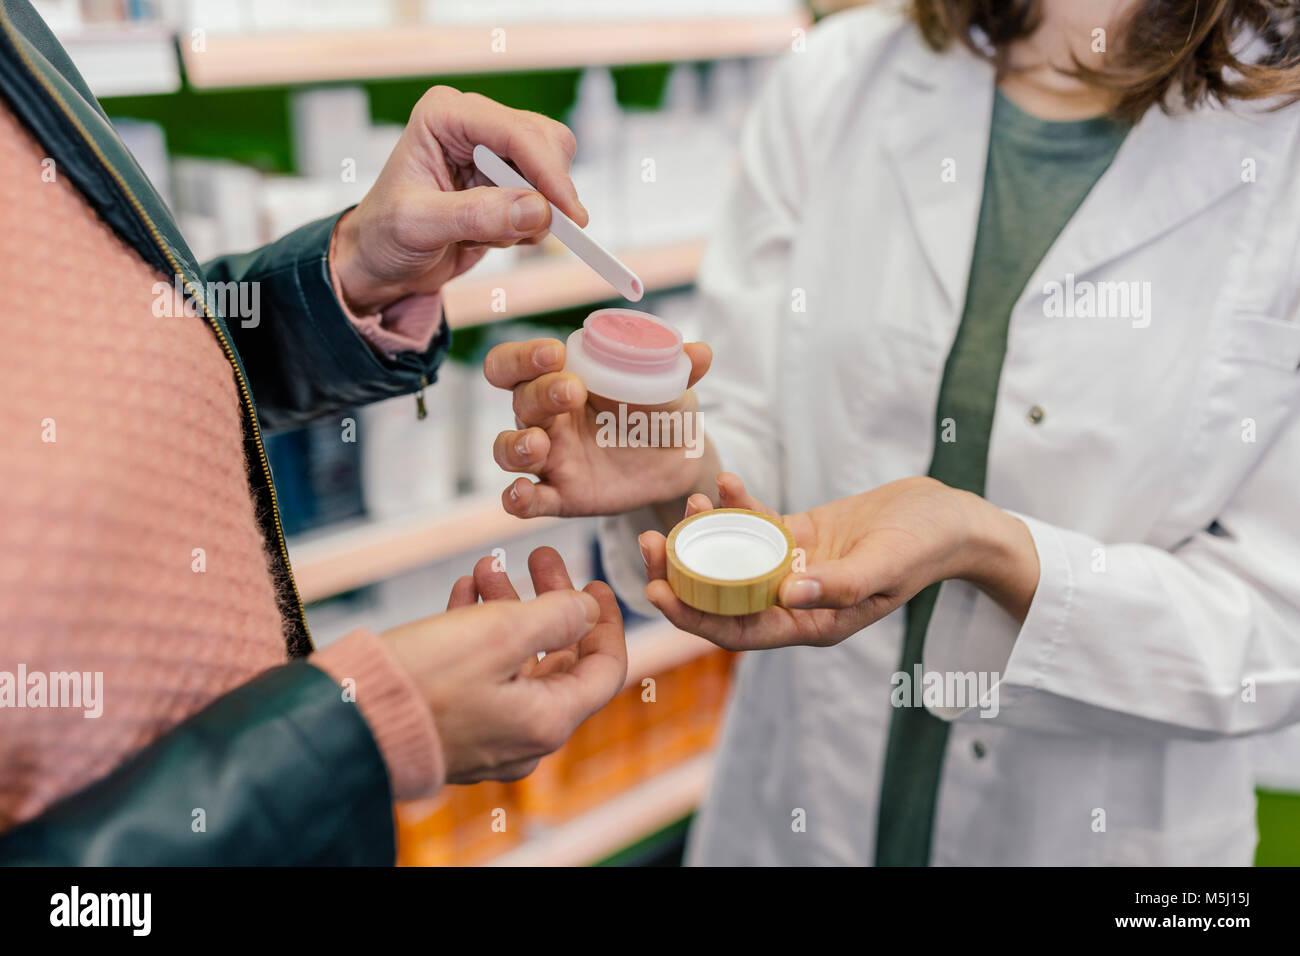 Customer testing cosmetics in pharmacy - Stock Image